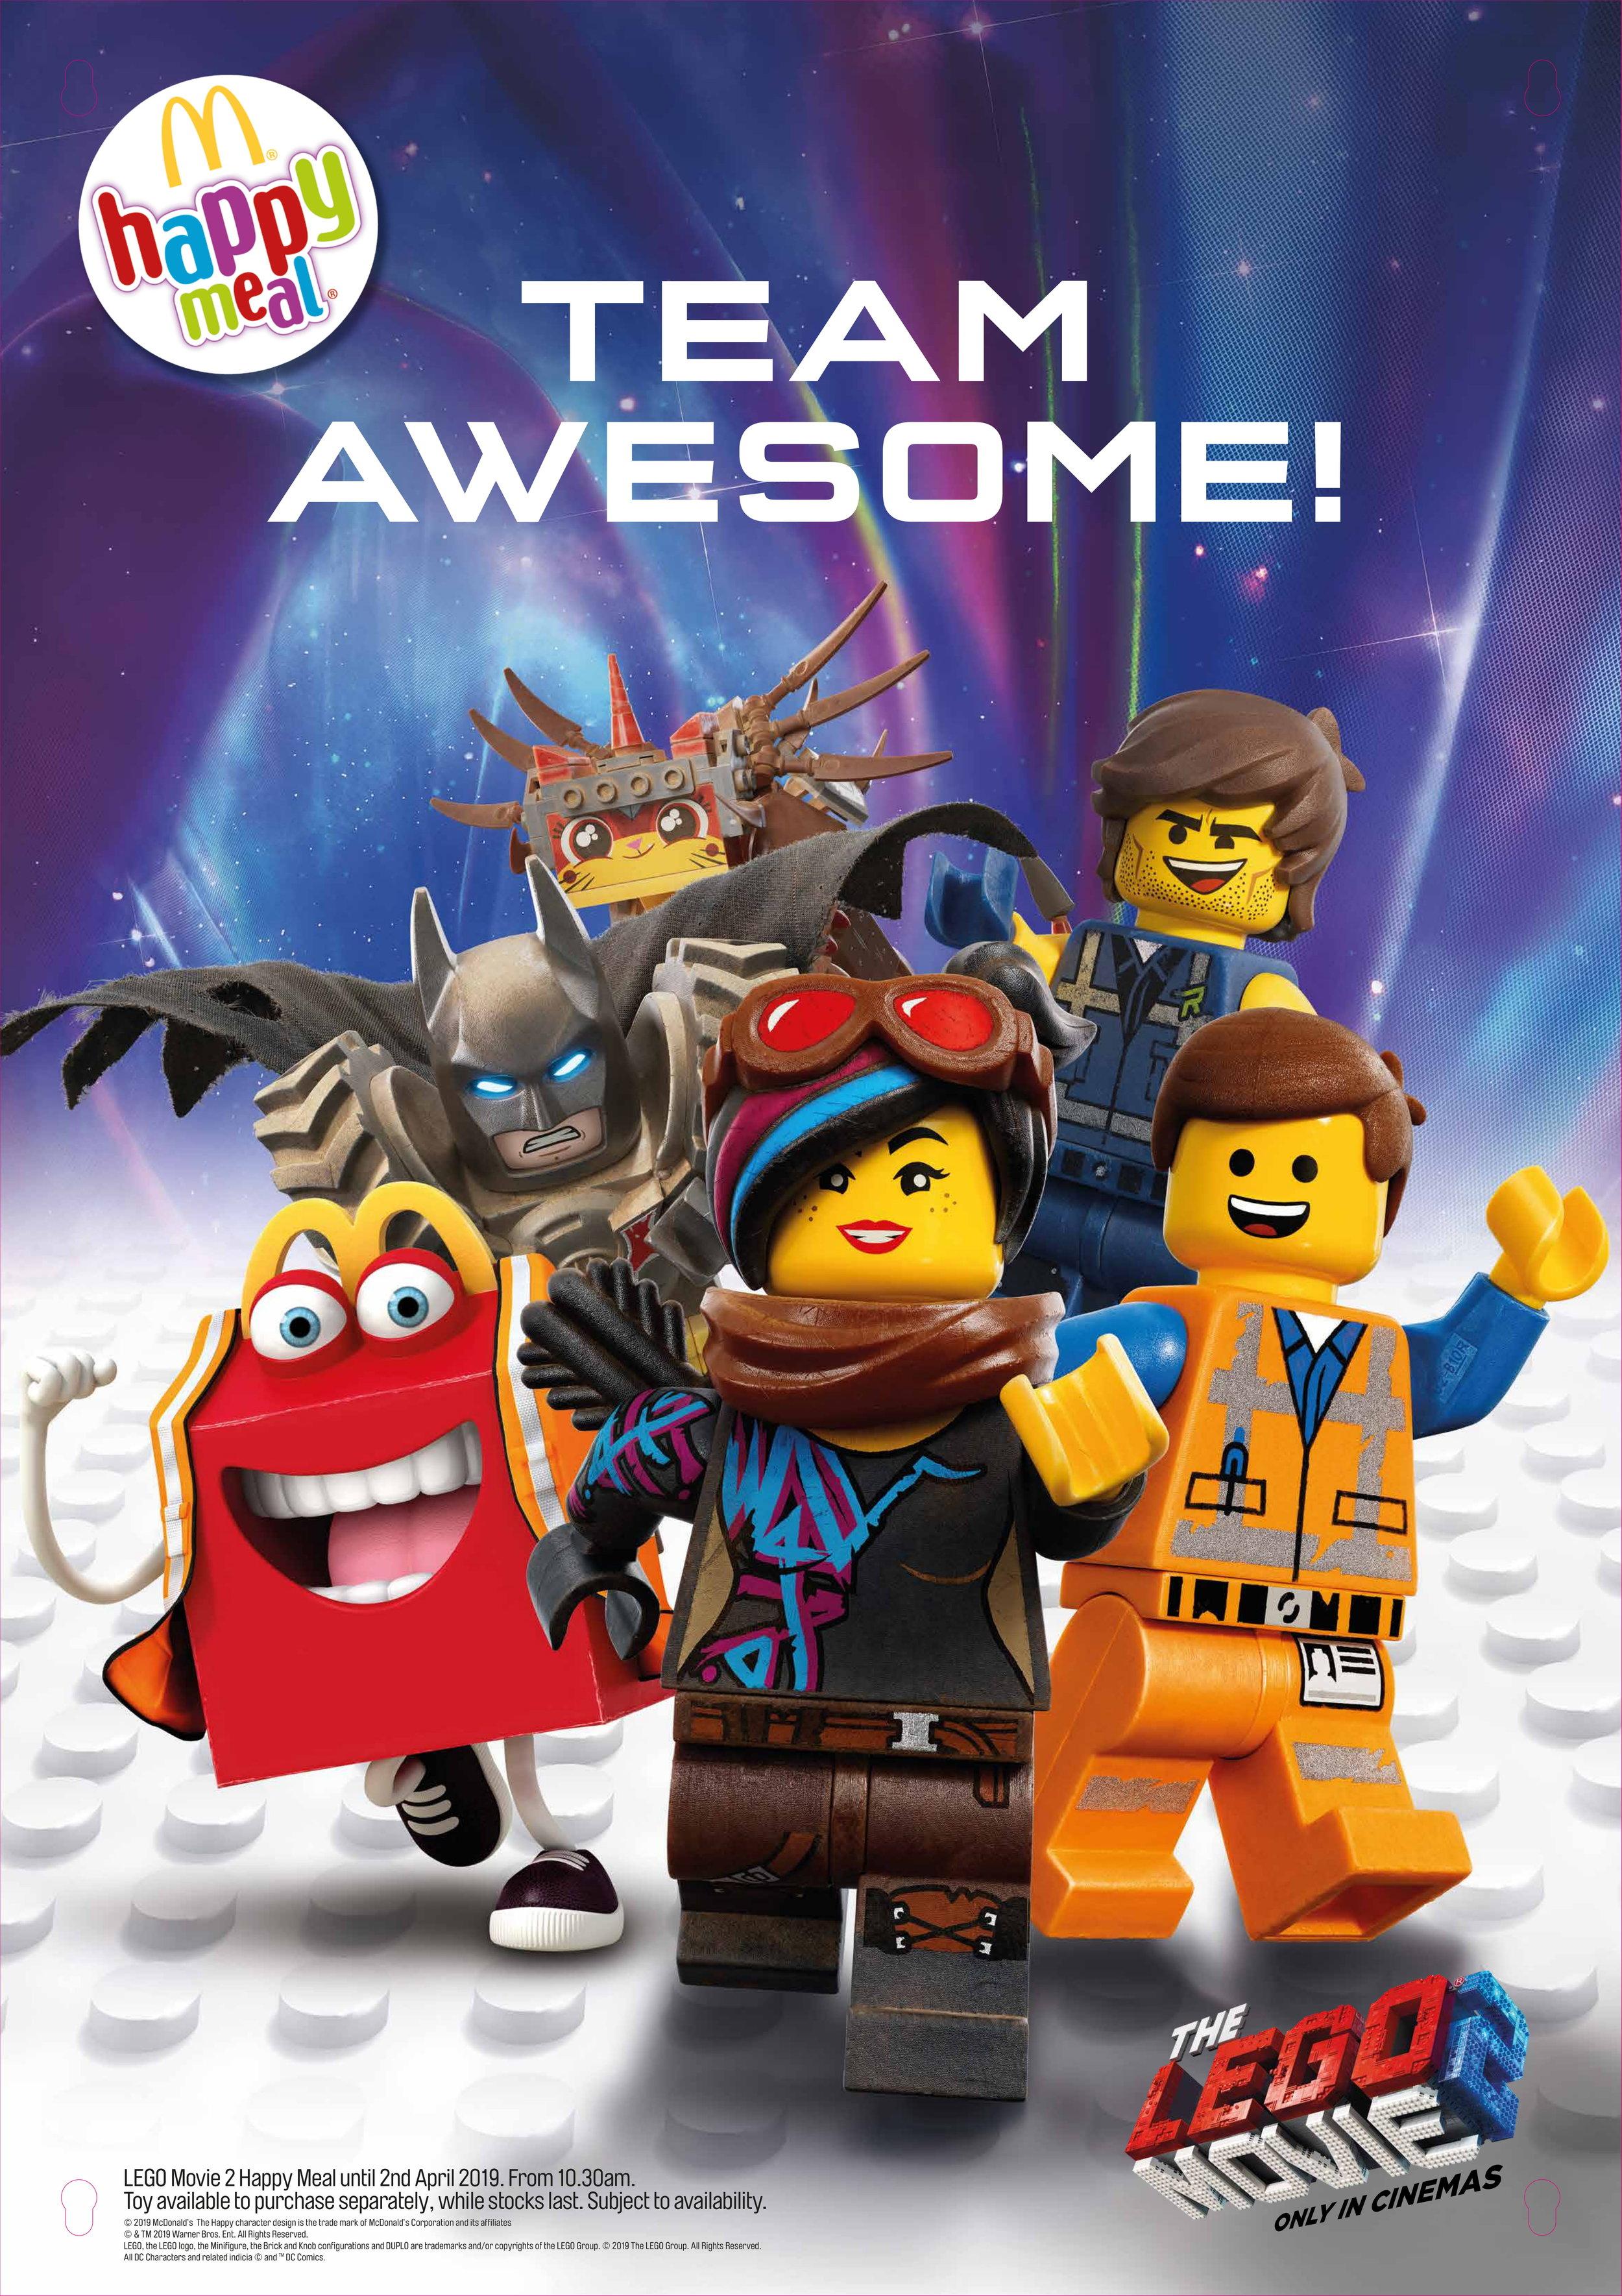 20723_3a_MCD_UKY_LEGO_2_2019_A1_Poster_AW-1.jpg